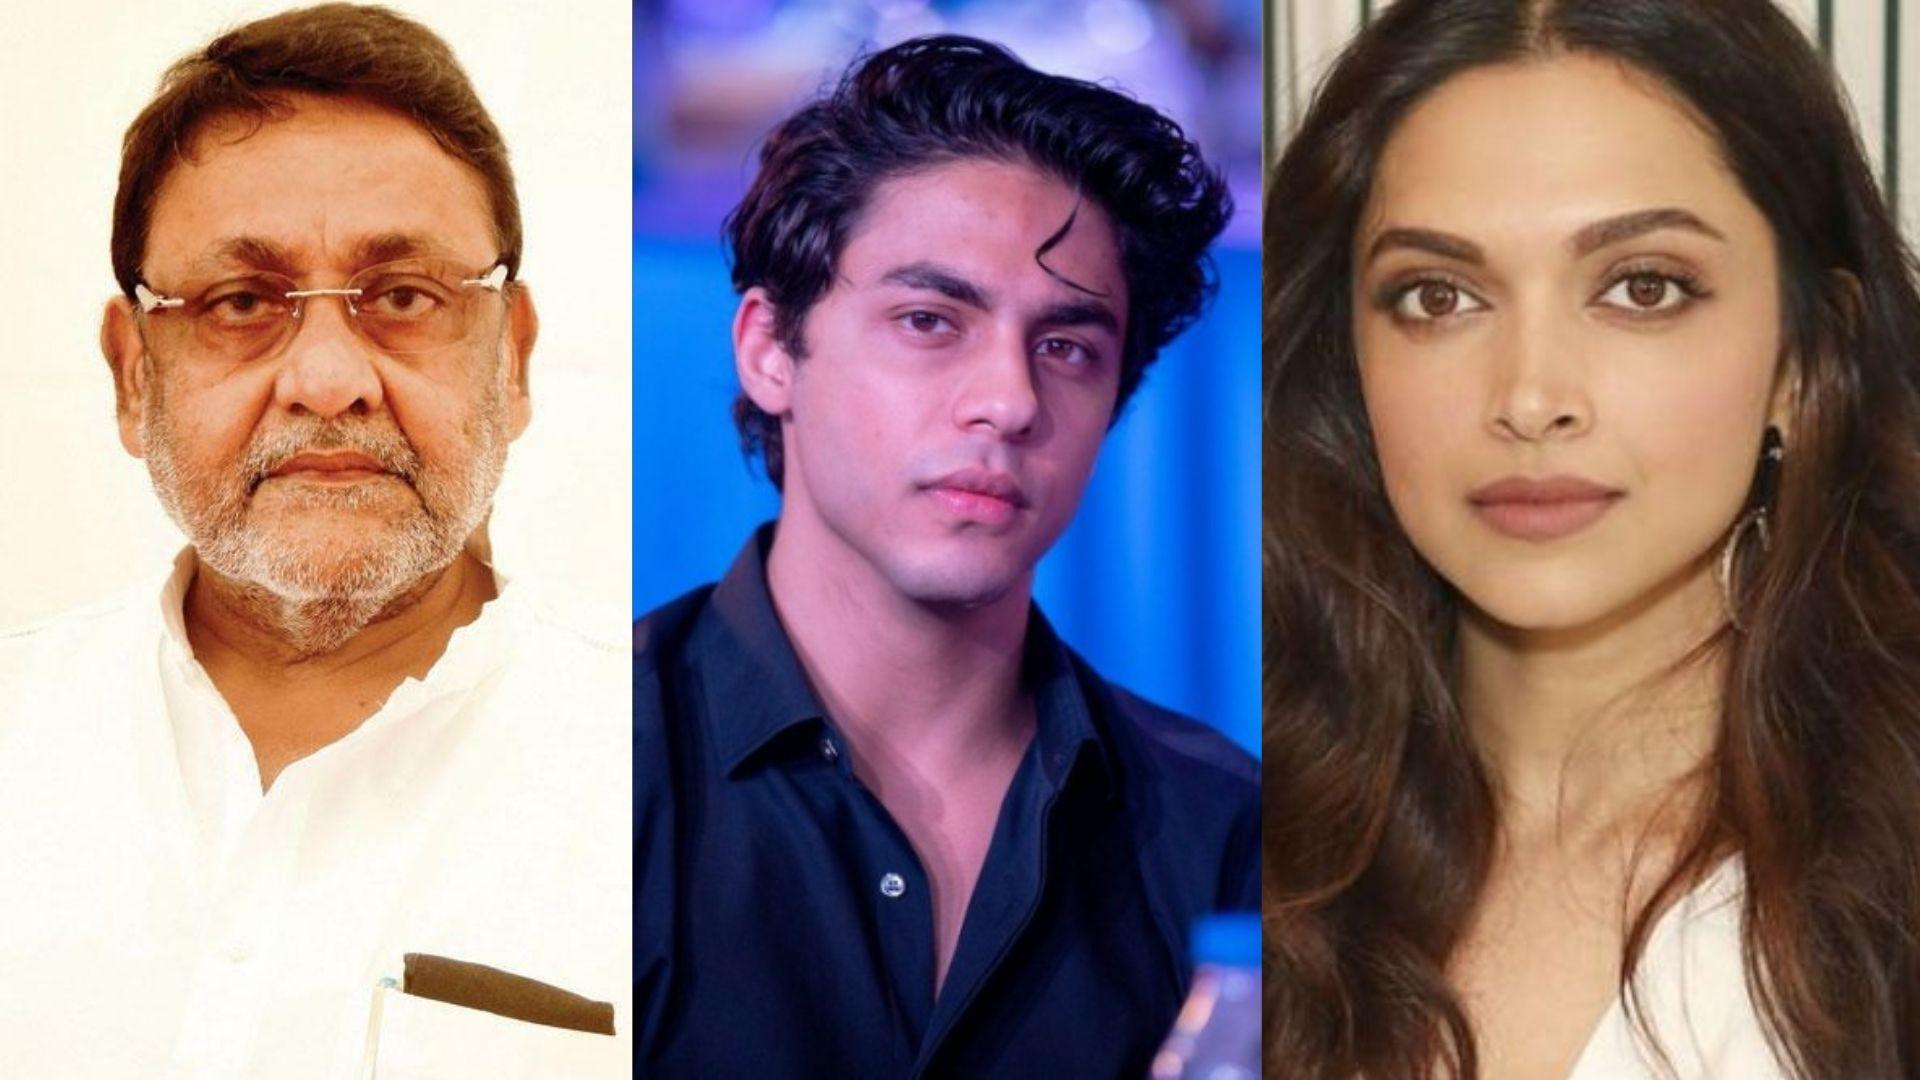 Aryan Khan Arrest Case: Nawab Malik Demands For An Electronic Probe In Shah Rukh Khan's Son's Case Citing Example of Deepika Padukone